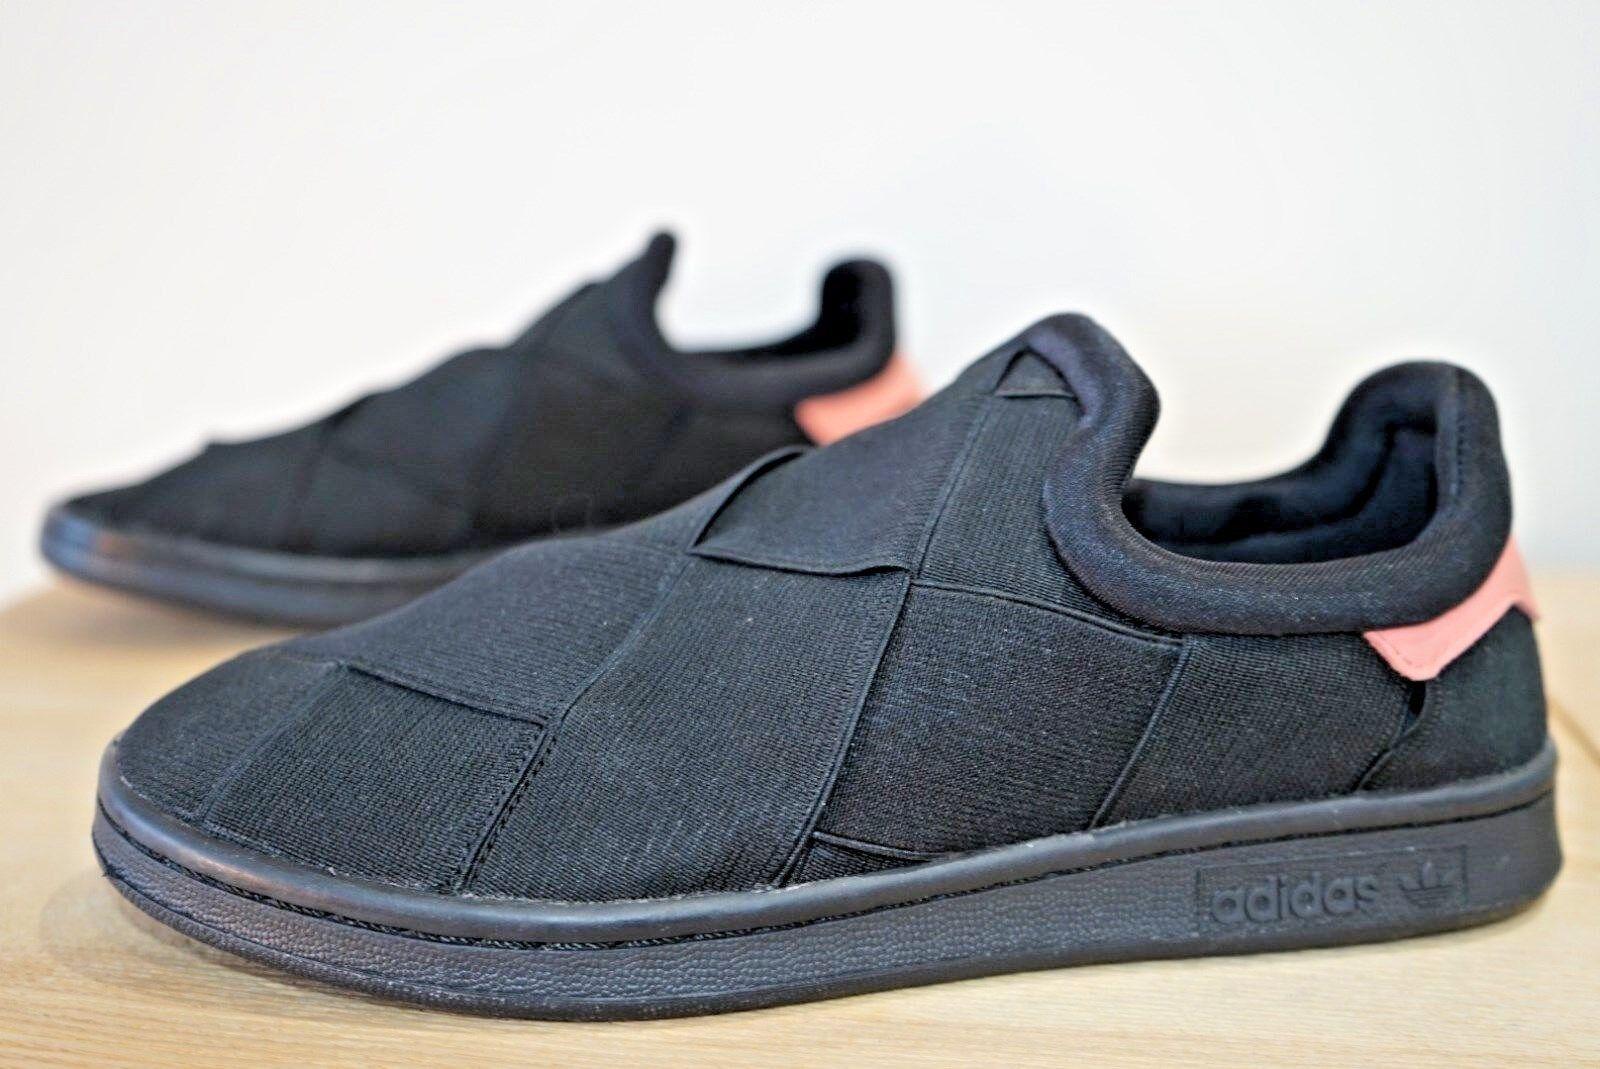 Adidas Cour remixé Originals Femme Baskets Chaussures Taille UK 5 noir (Nav)